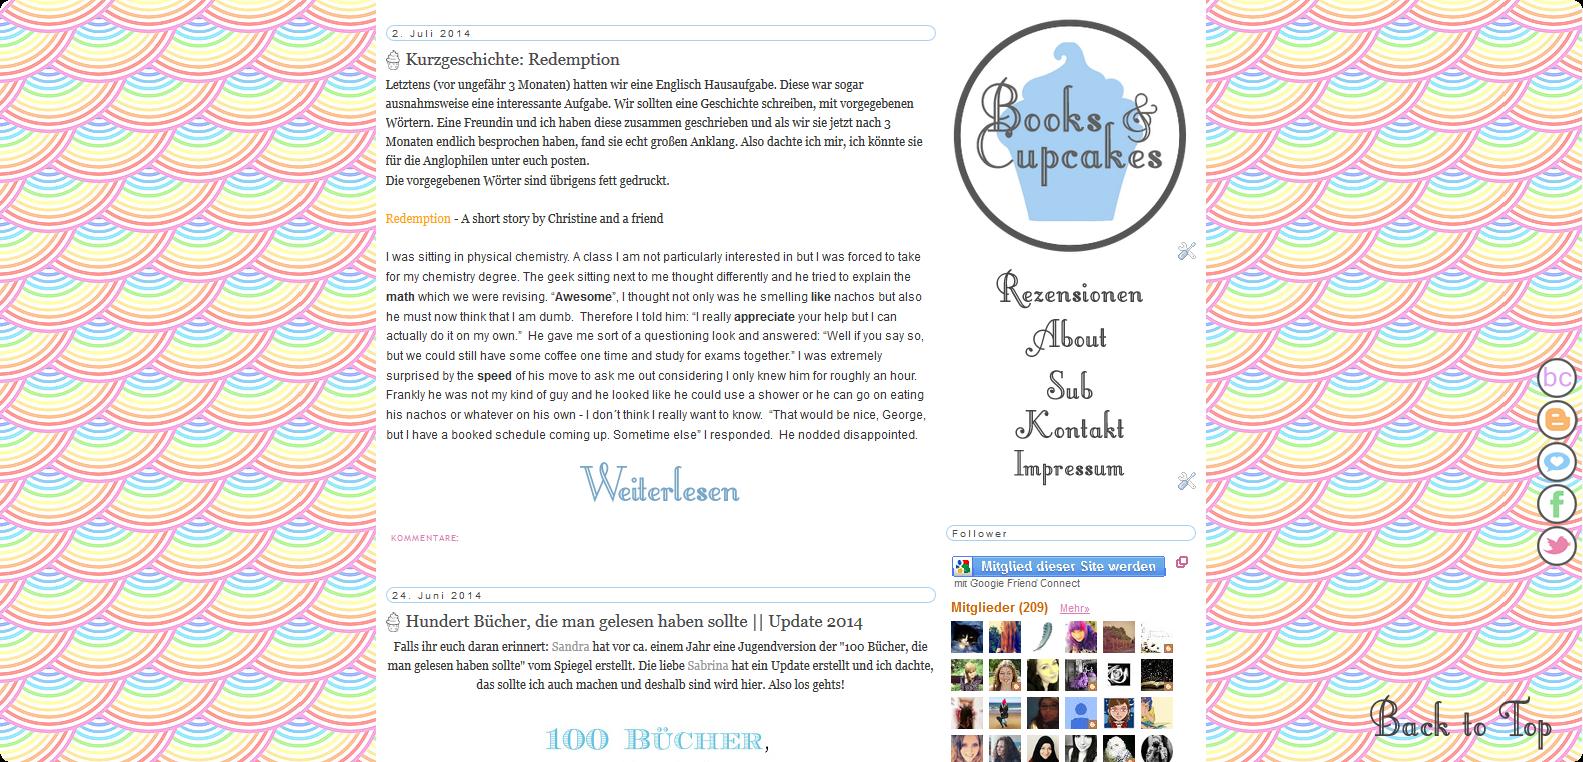 http://books-cupcakes.blogspot.de/